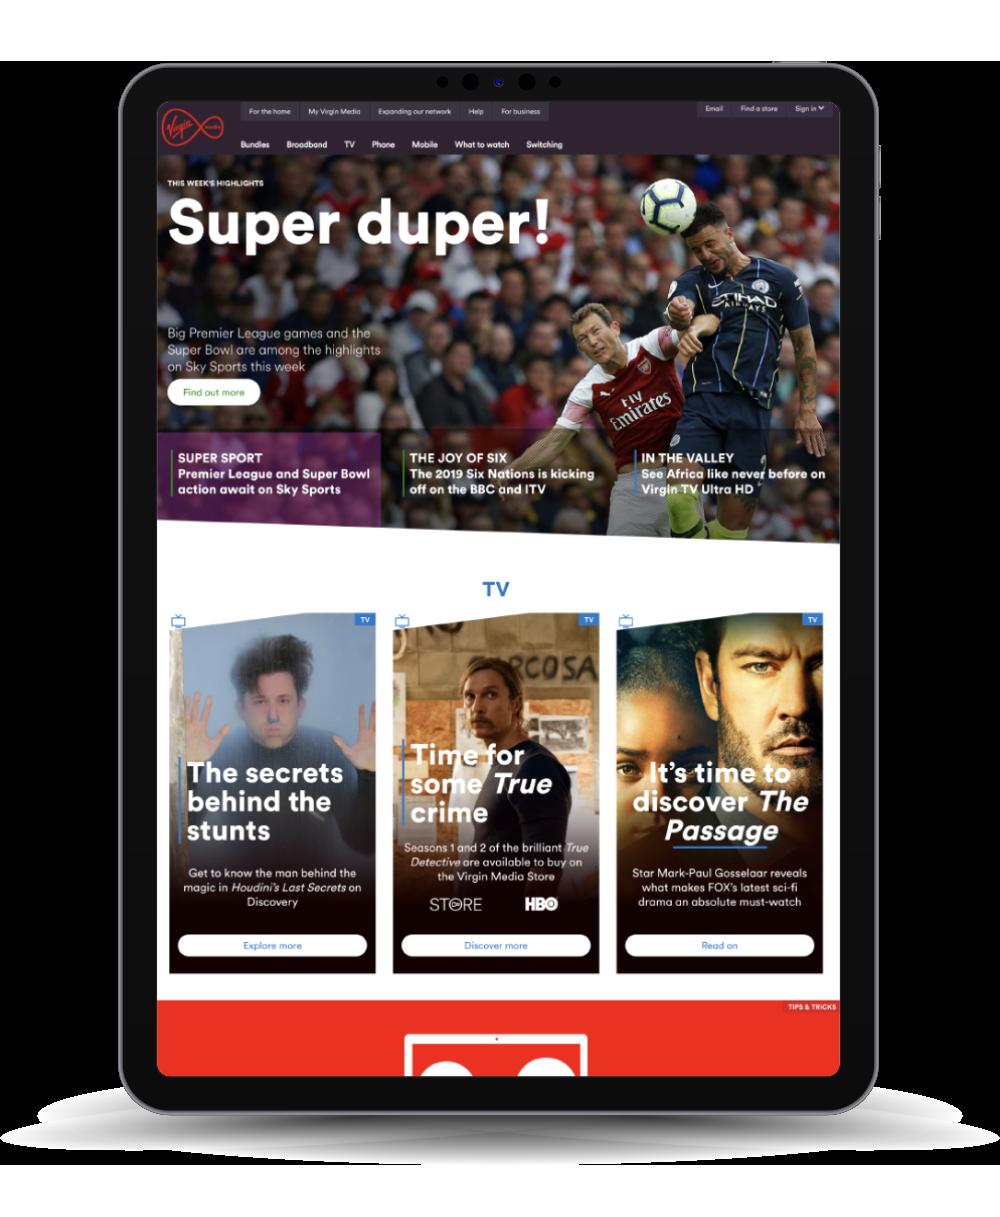 Virgin TV Edit-iPad.png